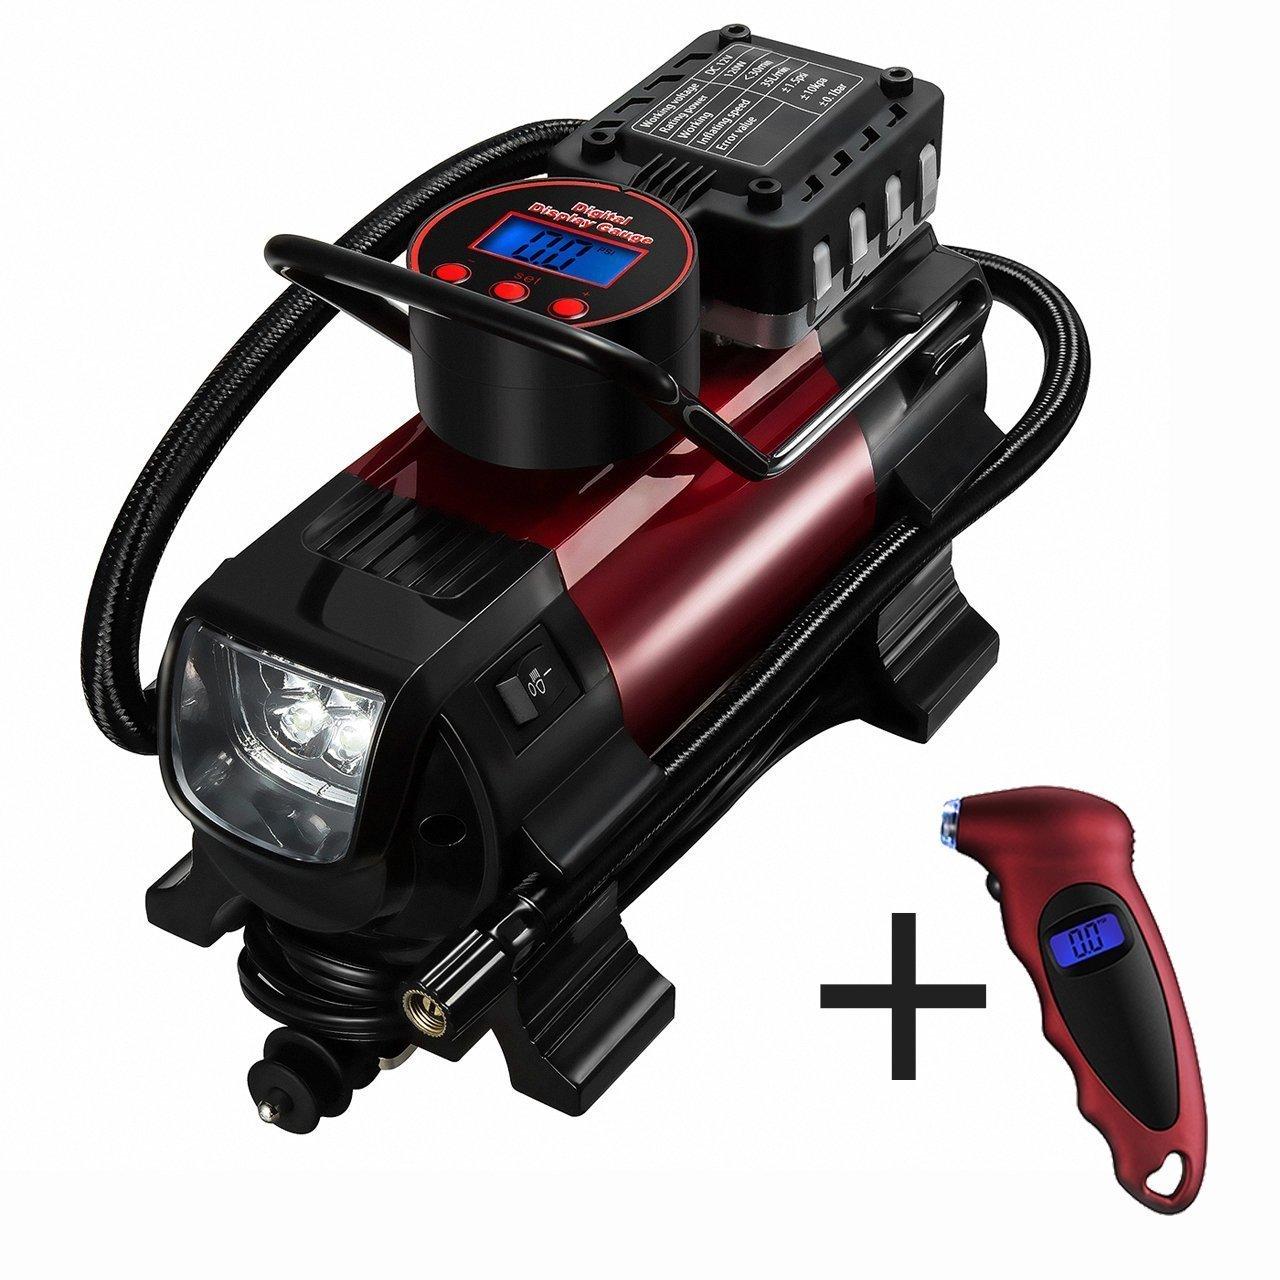 The Cheapest Price Premium Heavy Duty 12v Air Compressor 40l 100psi Tyre Inflator Led Lamp Heyner® Ebay Motors